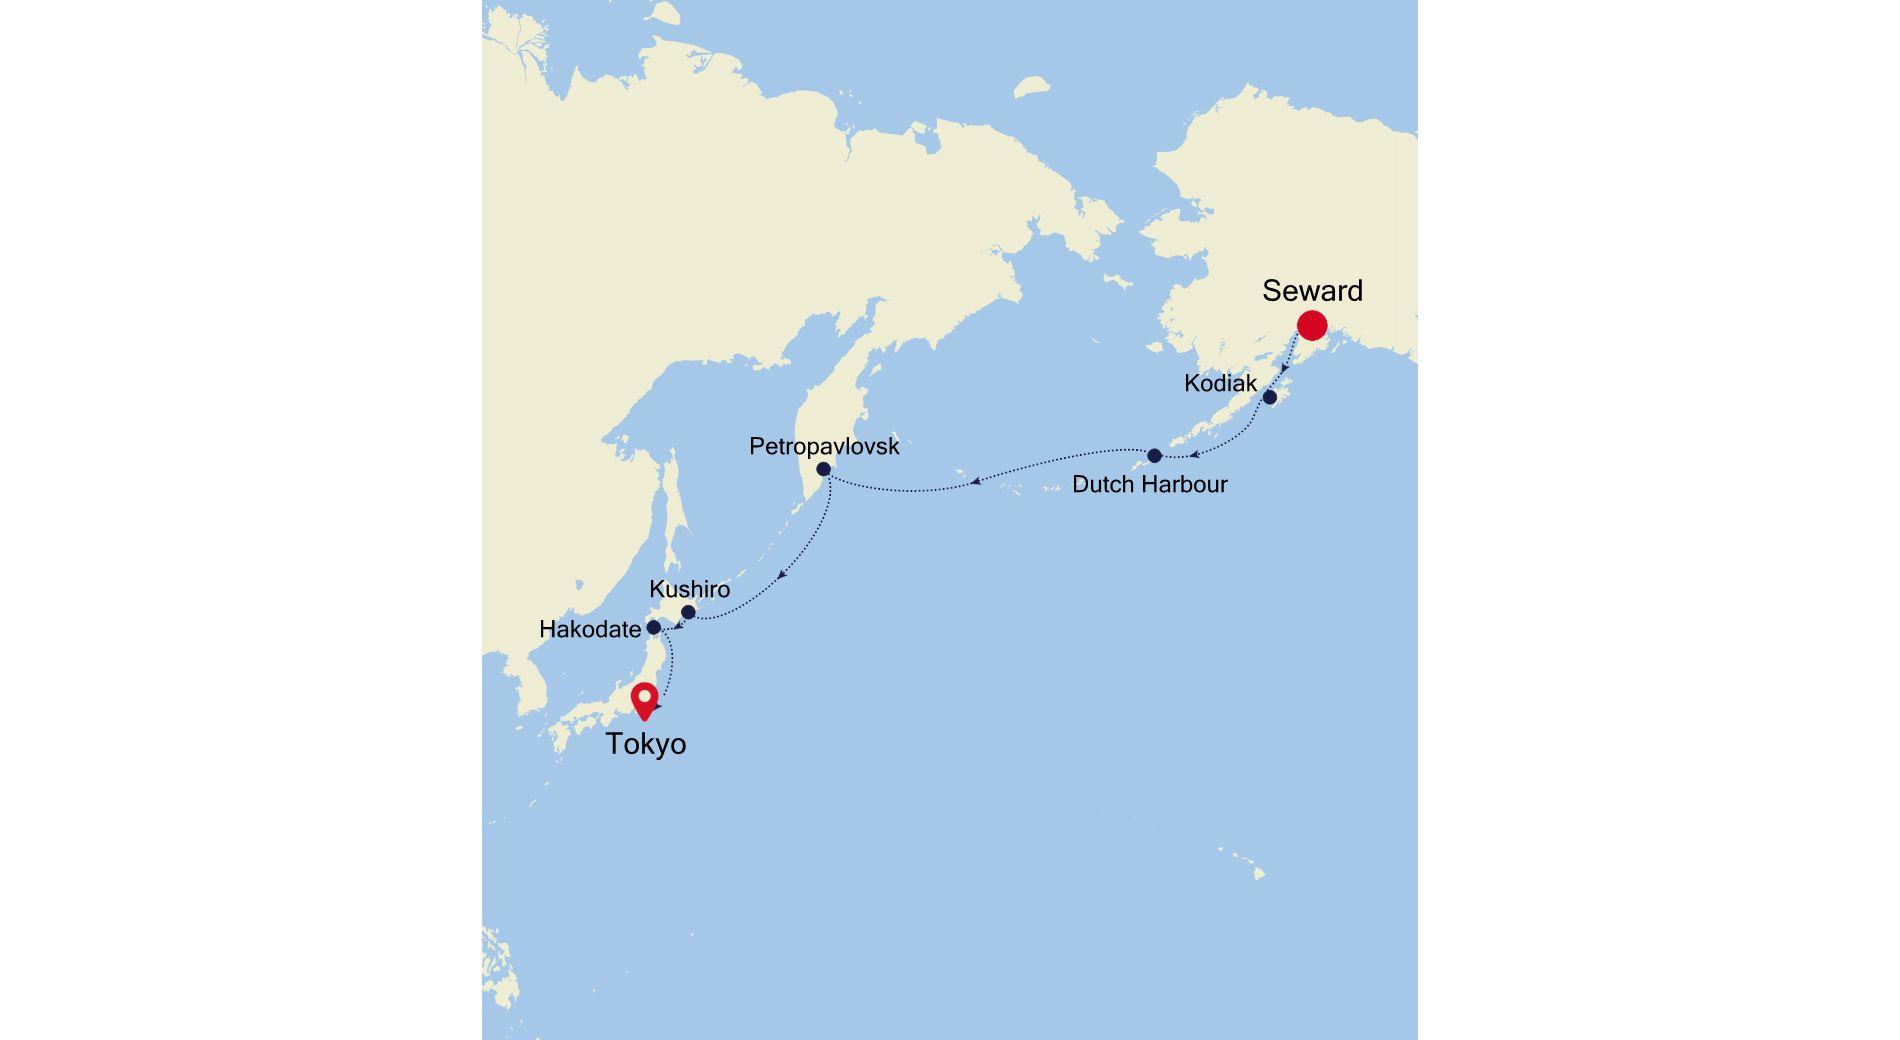 SM200910013 - Seward (Anchorage to Tokyo